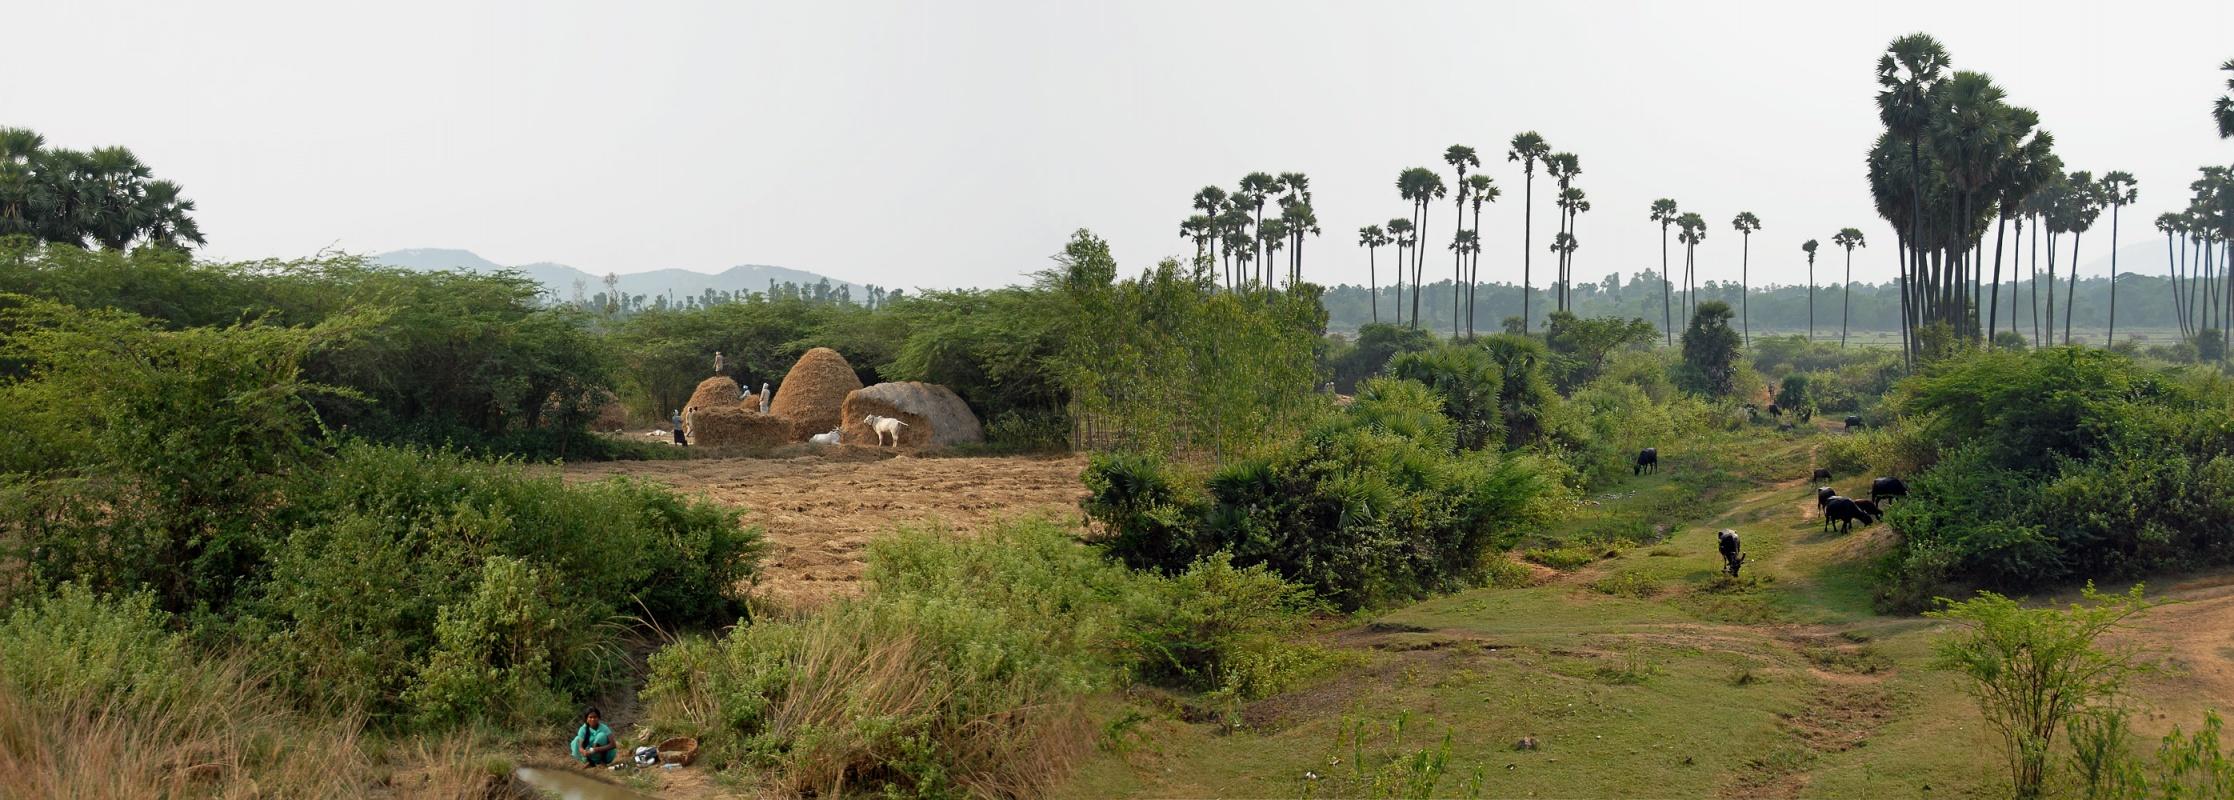 orissascape Panorama From the Train,  Andhra Pradesh, India, 2007